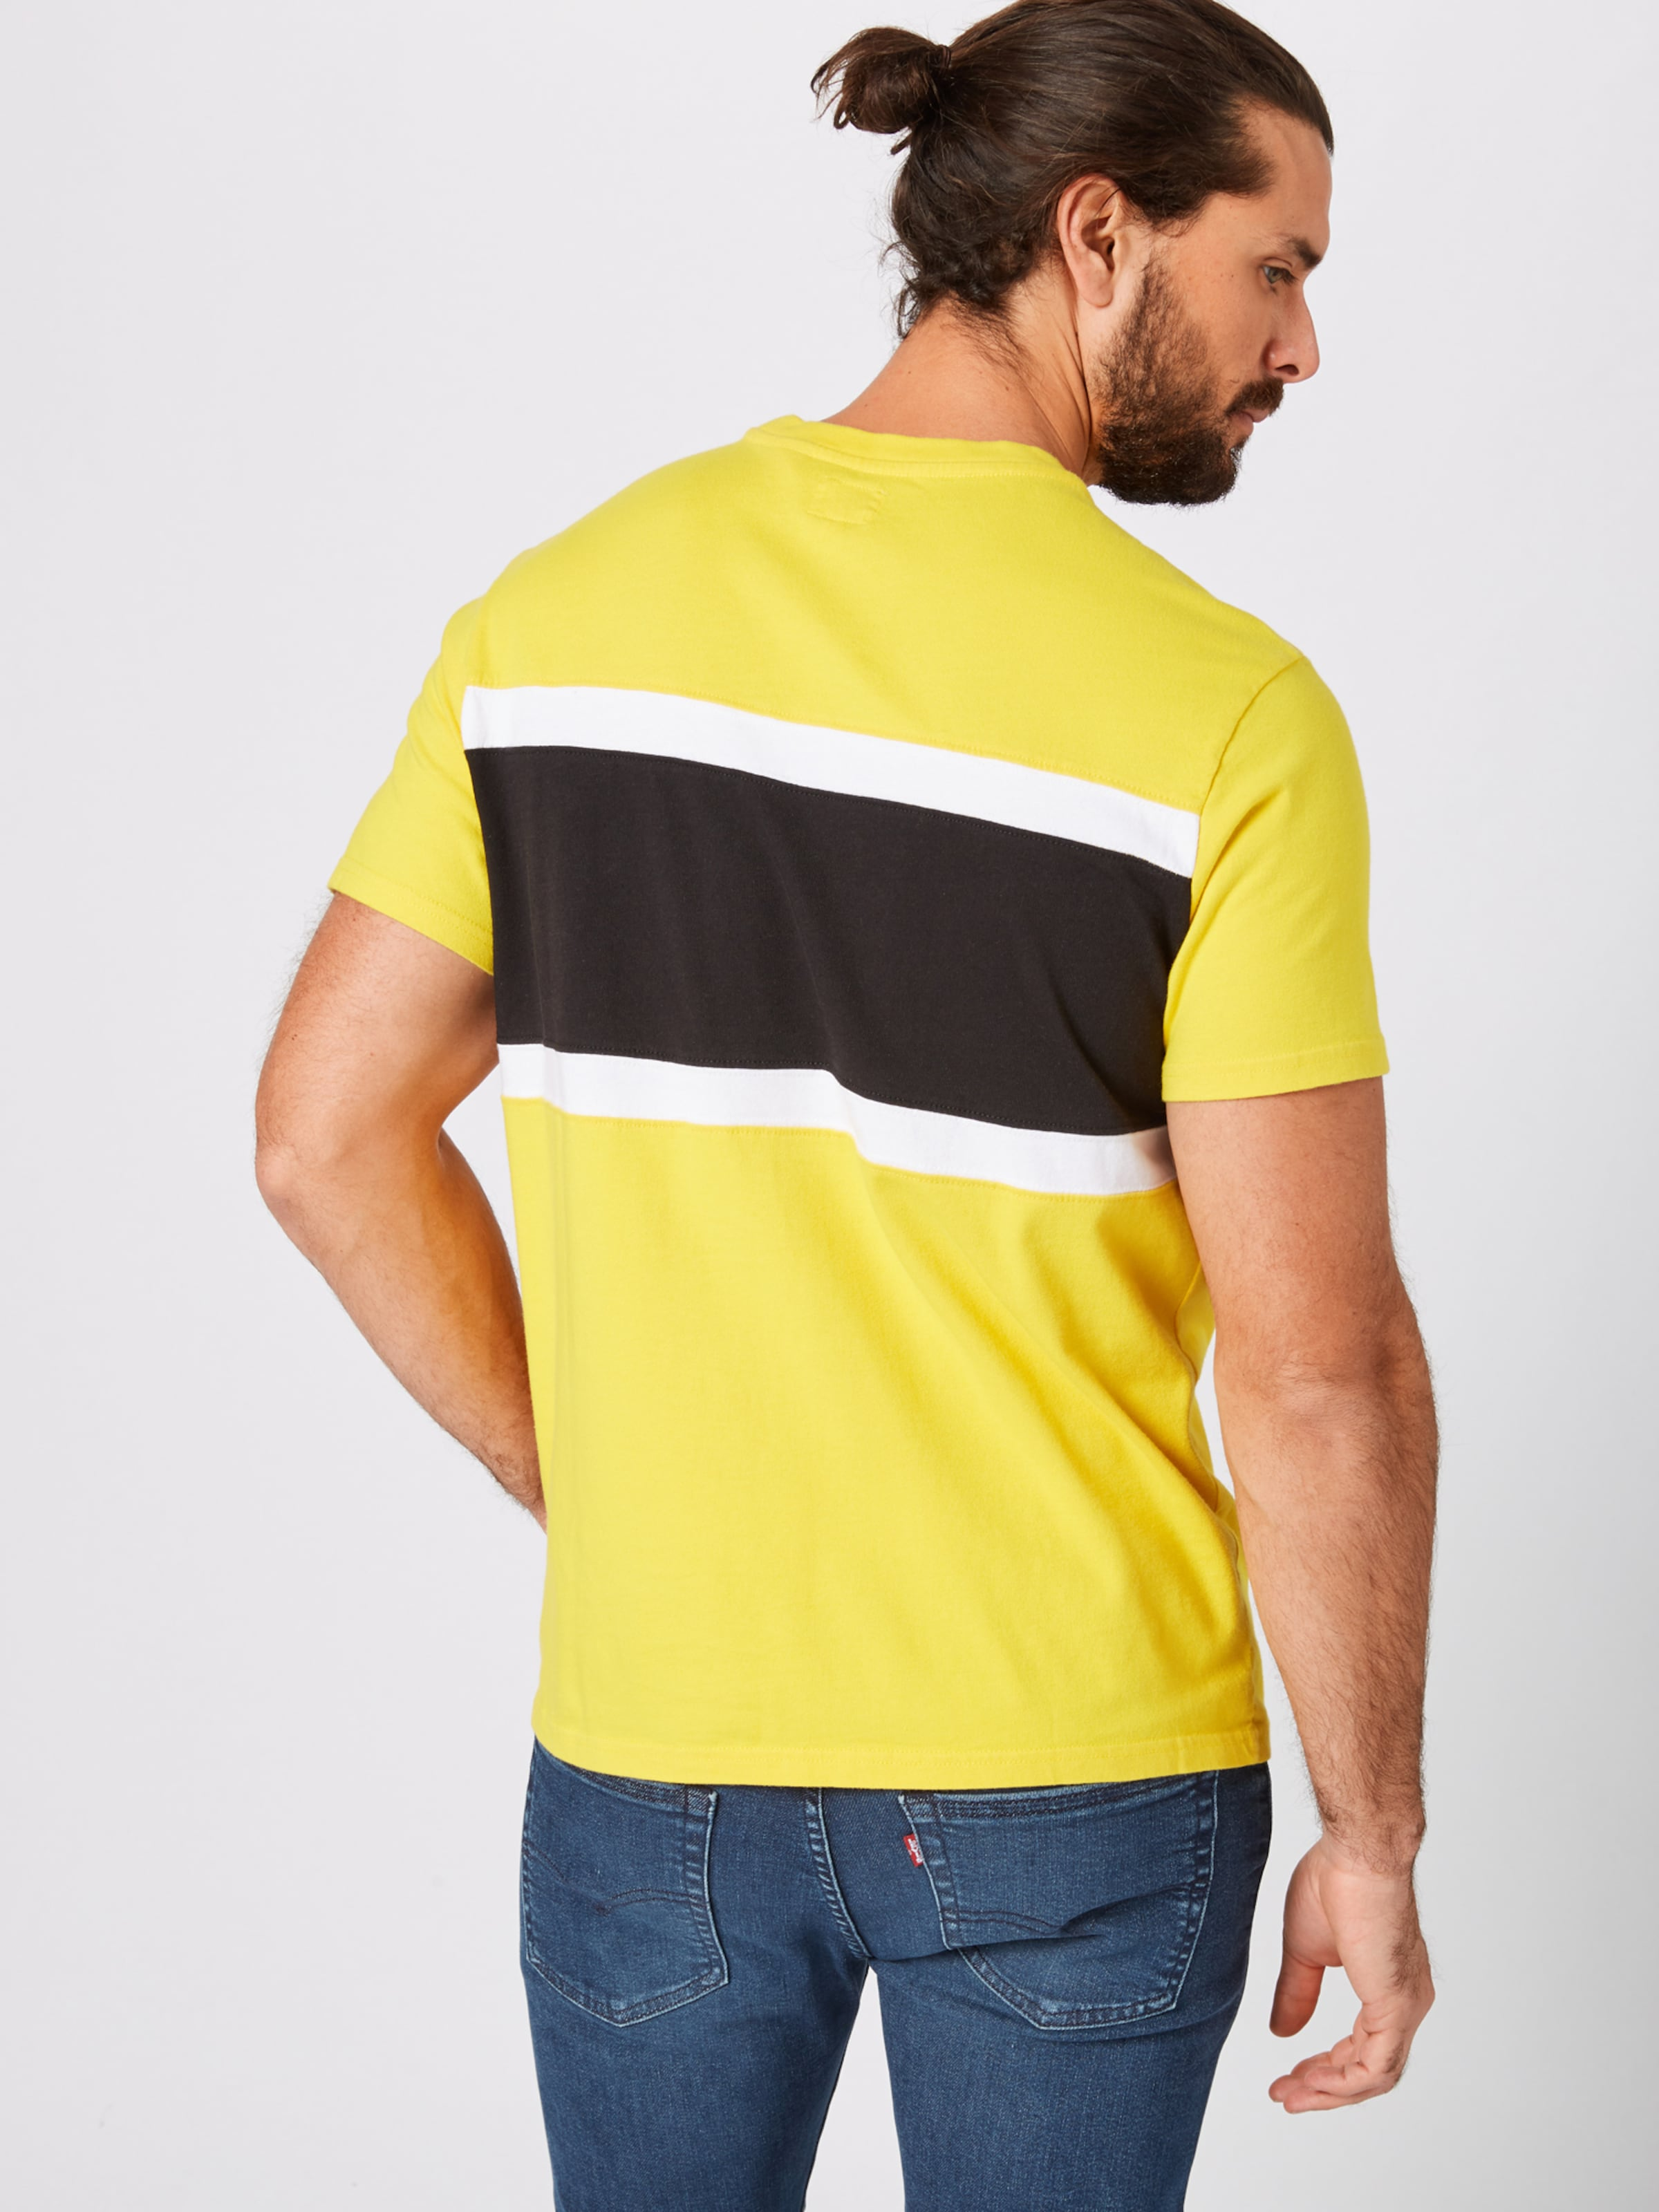 Shirt Levi's In Levi's In GelbSchwarz 'colorblocktee' Shirt 'colorblocktee' n0wNyO8vm